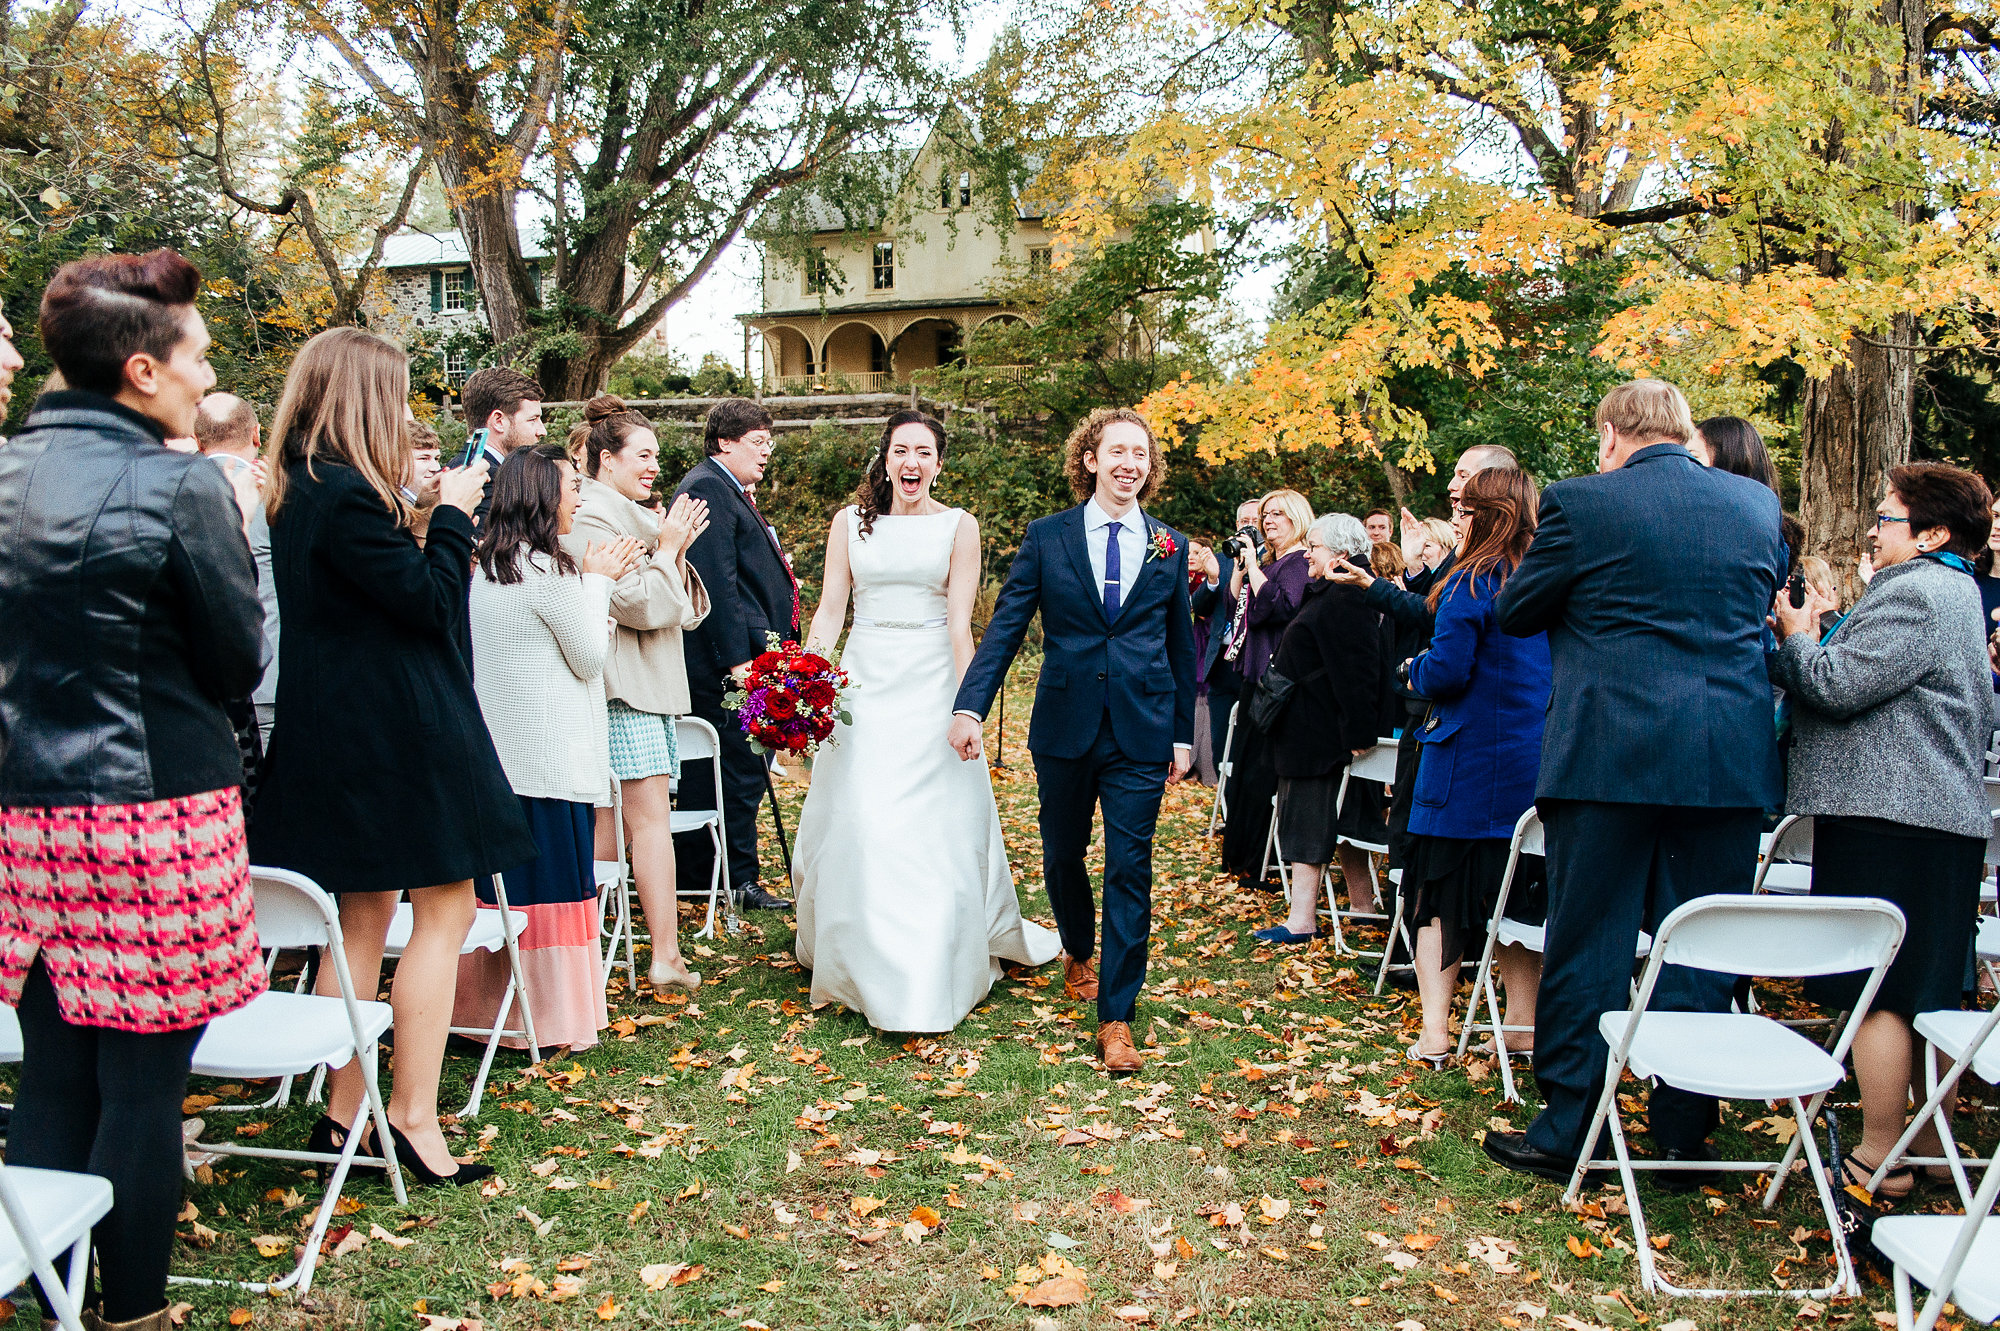 wedding_prep_ceremony14.JPG